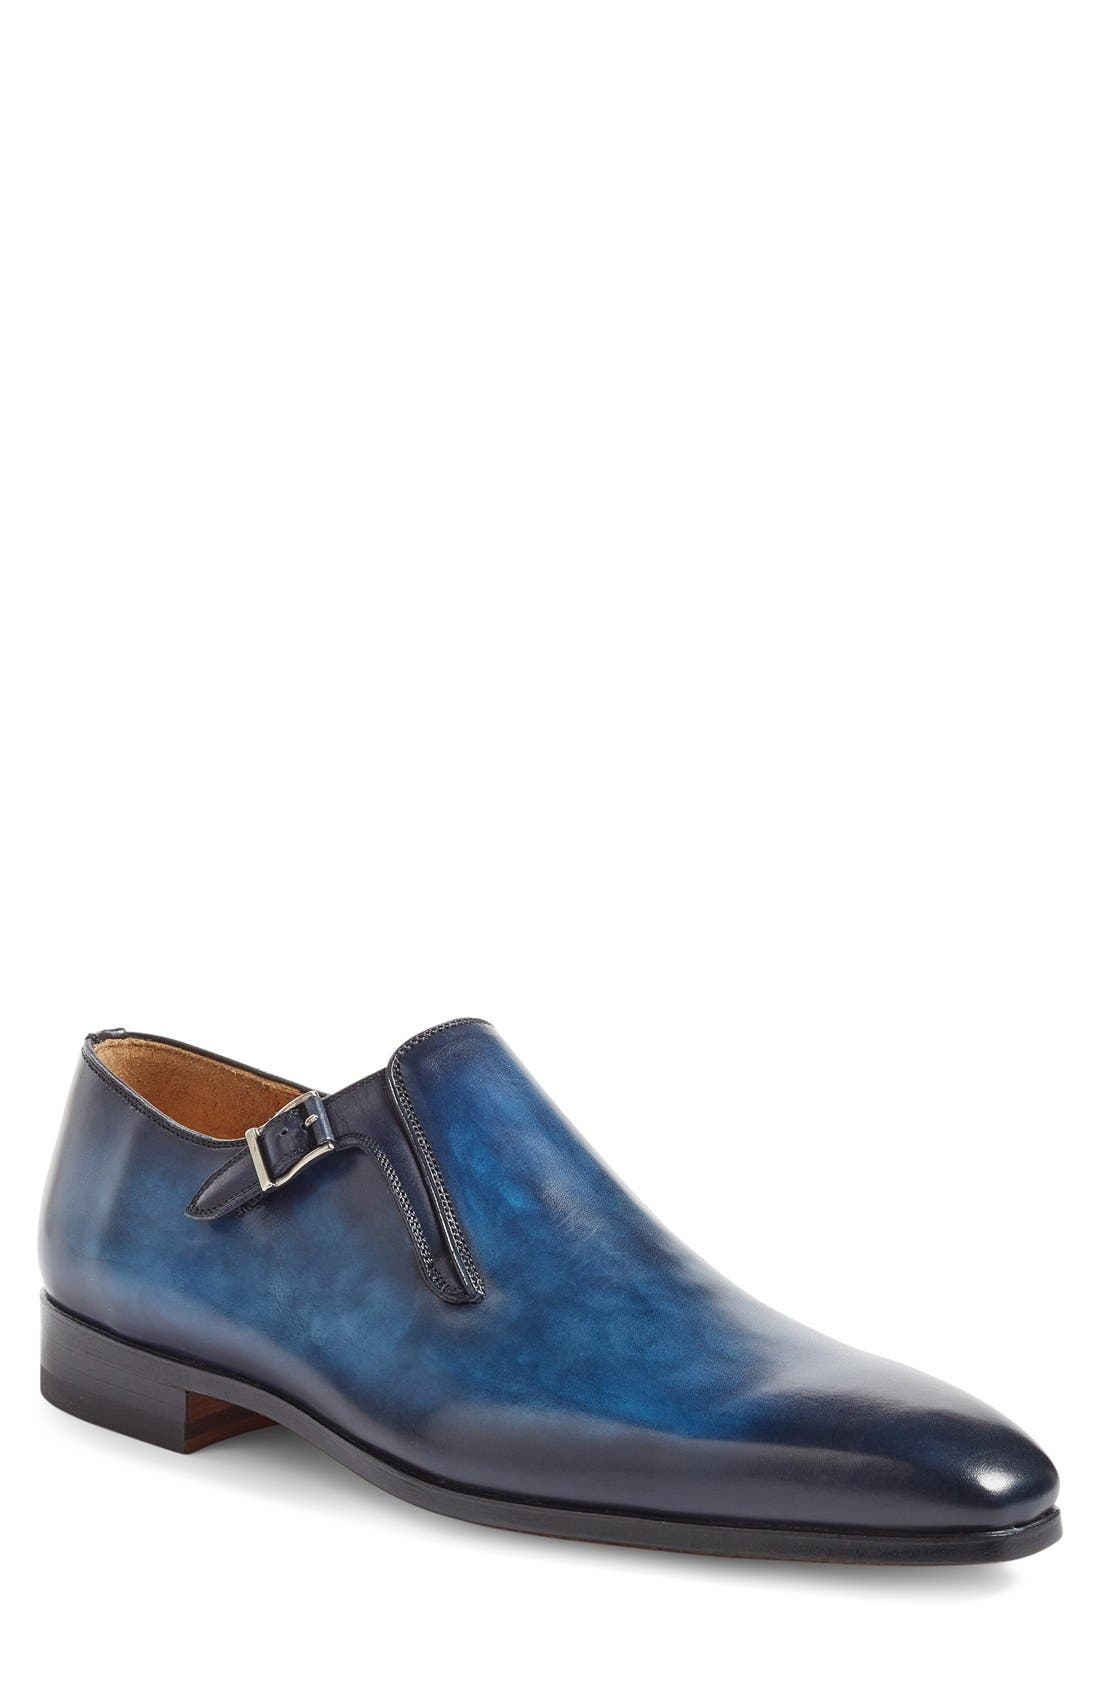 Beltran Monk Strap Shoe,                         Main,                         color, 410